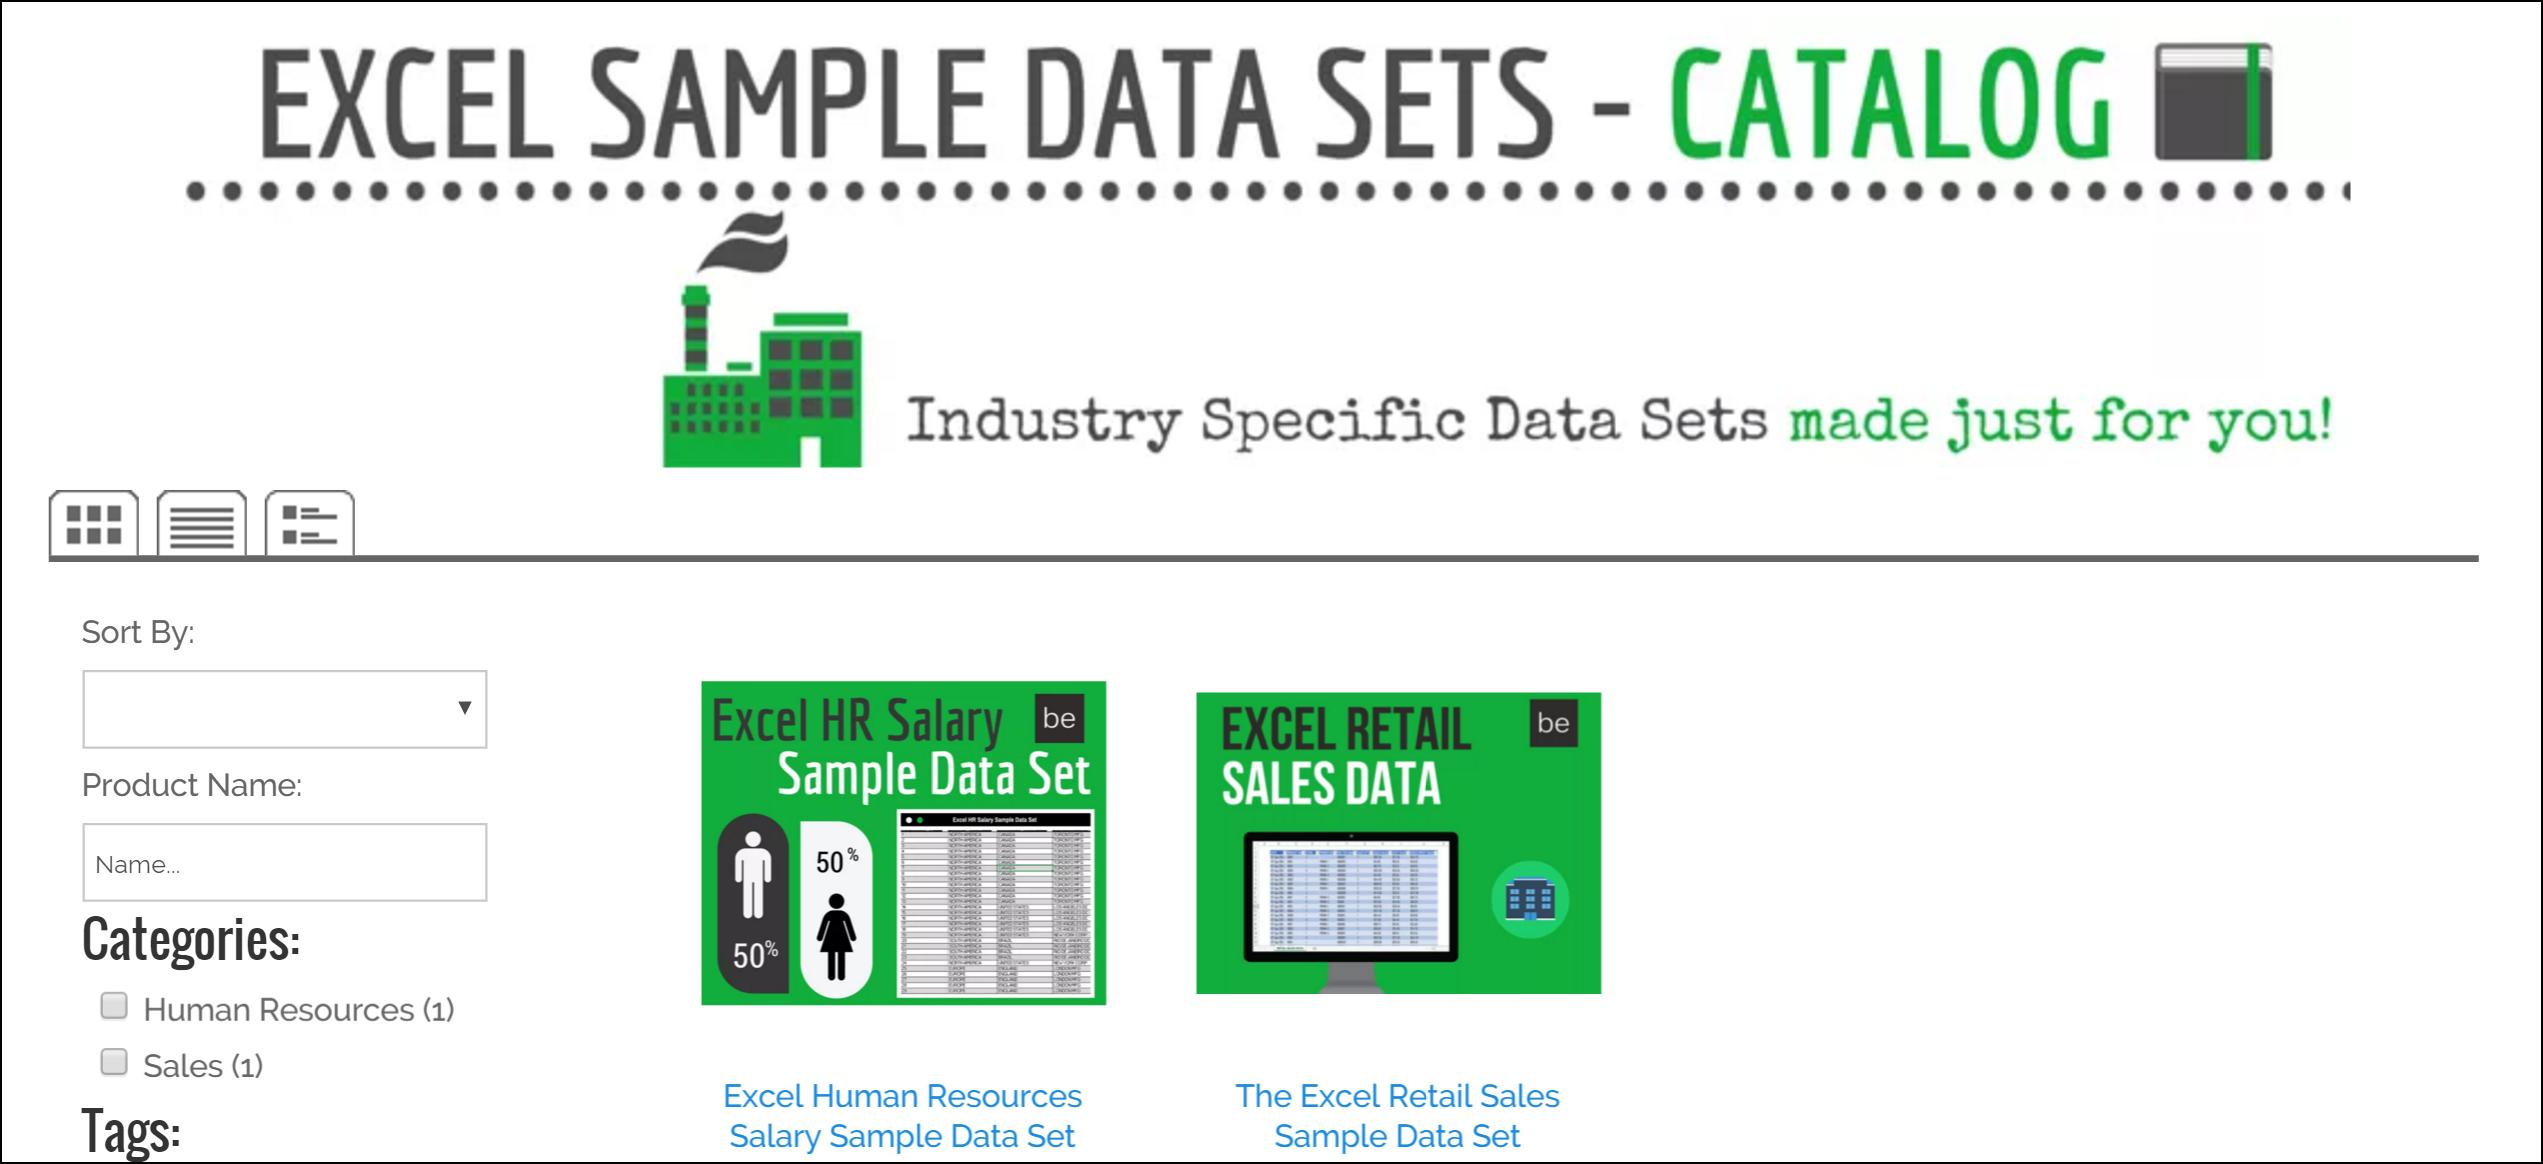 Excel Sample Data Sets - BRAD EDGAR